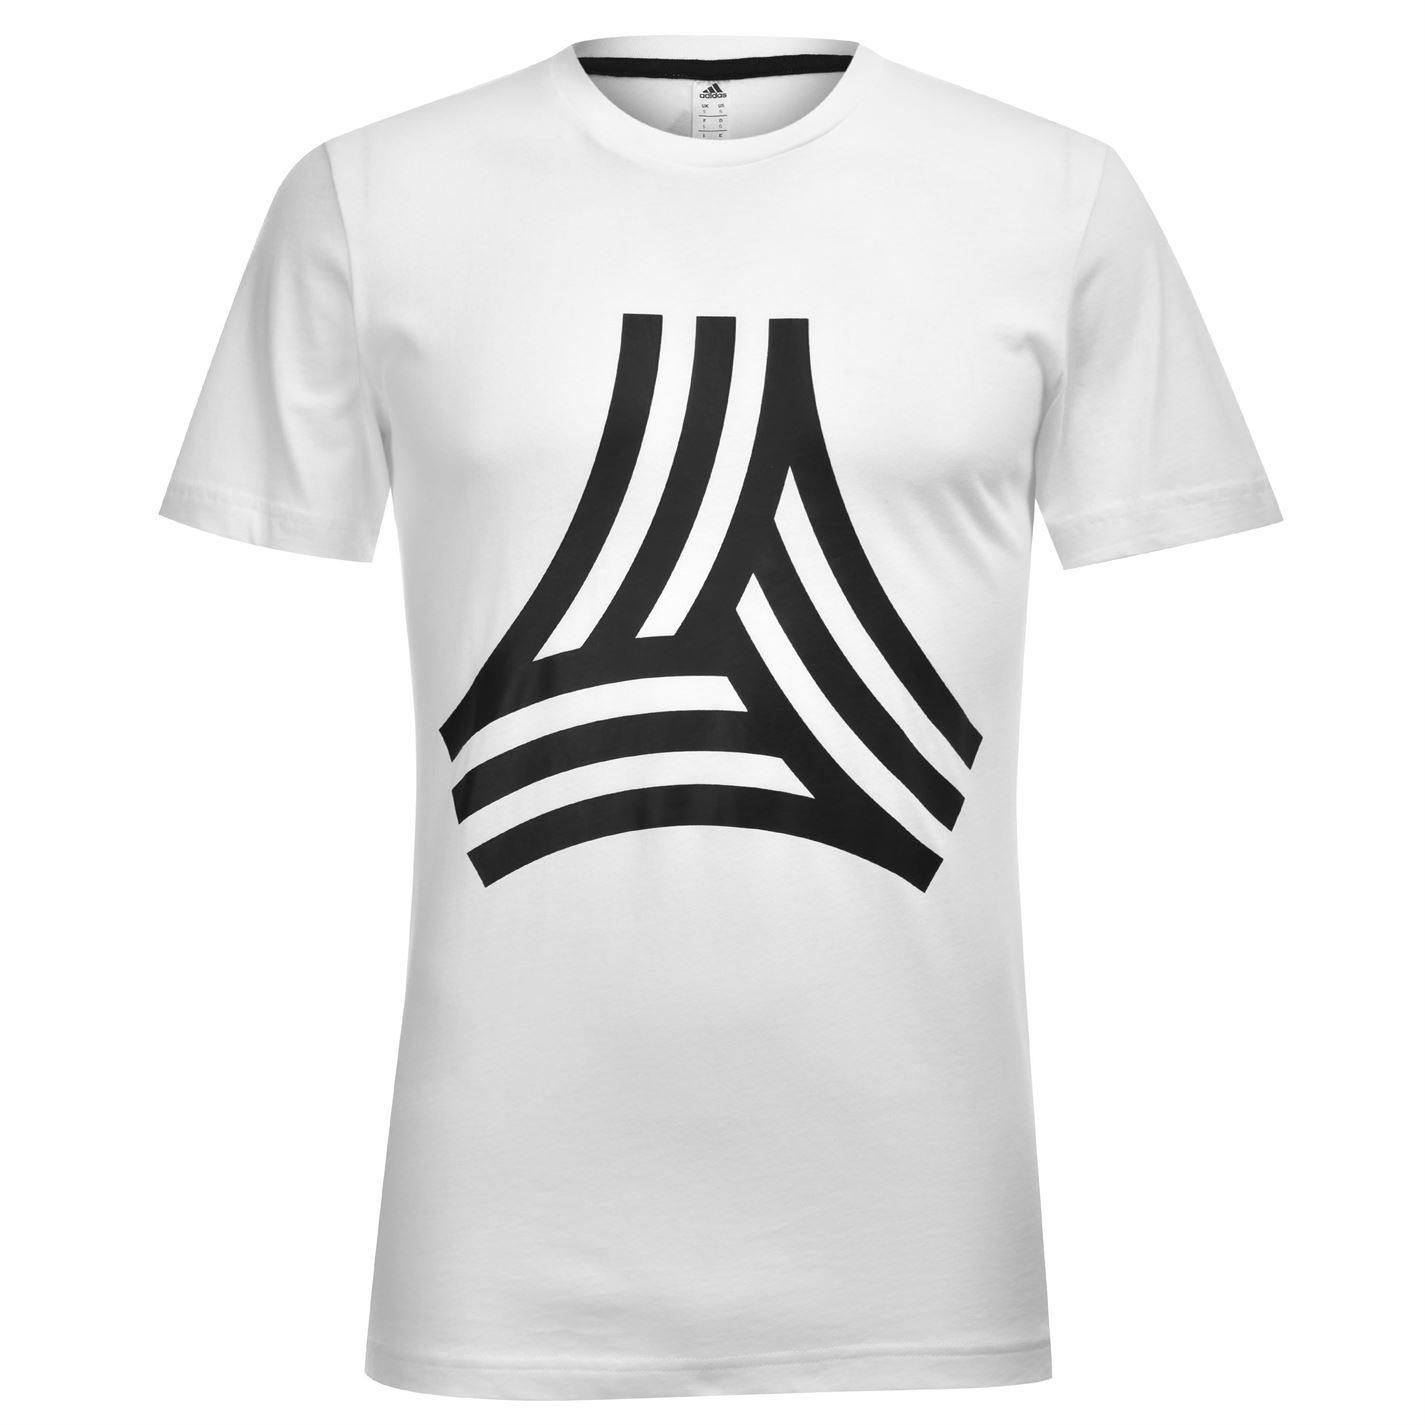 Adidas Tan Graphic Cotton T-Shirt Men's